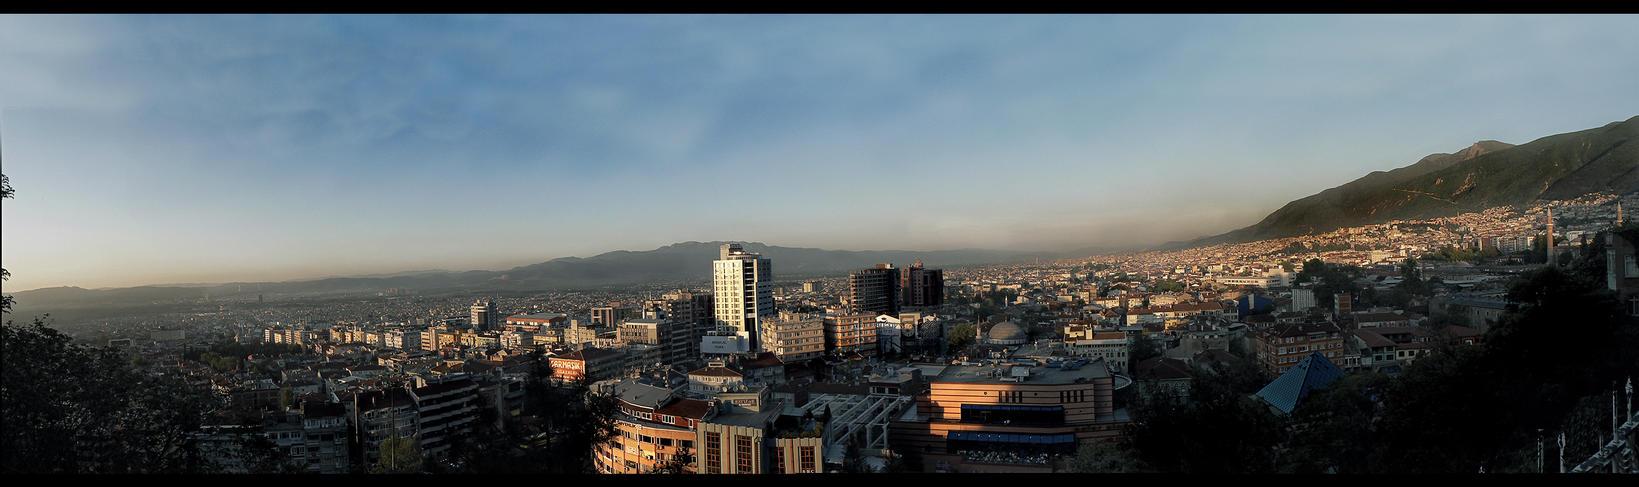 Bursa Panorama by Braq